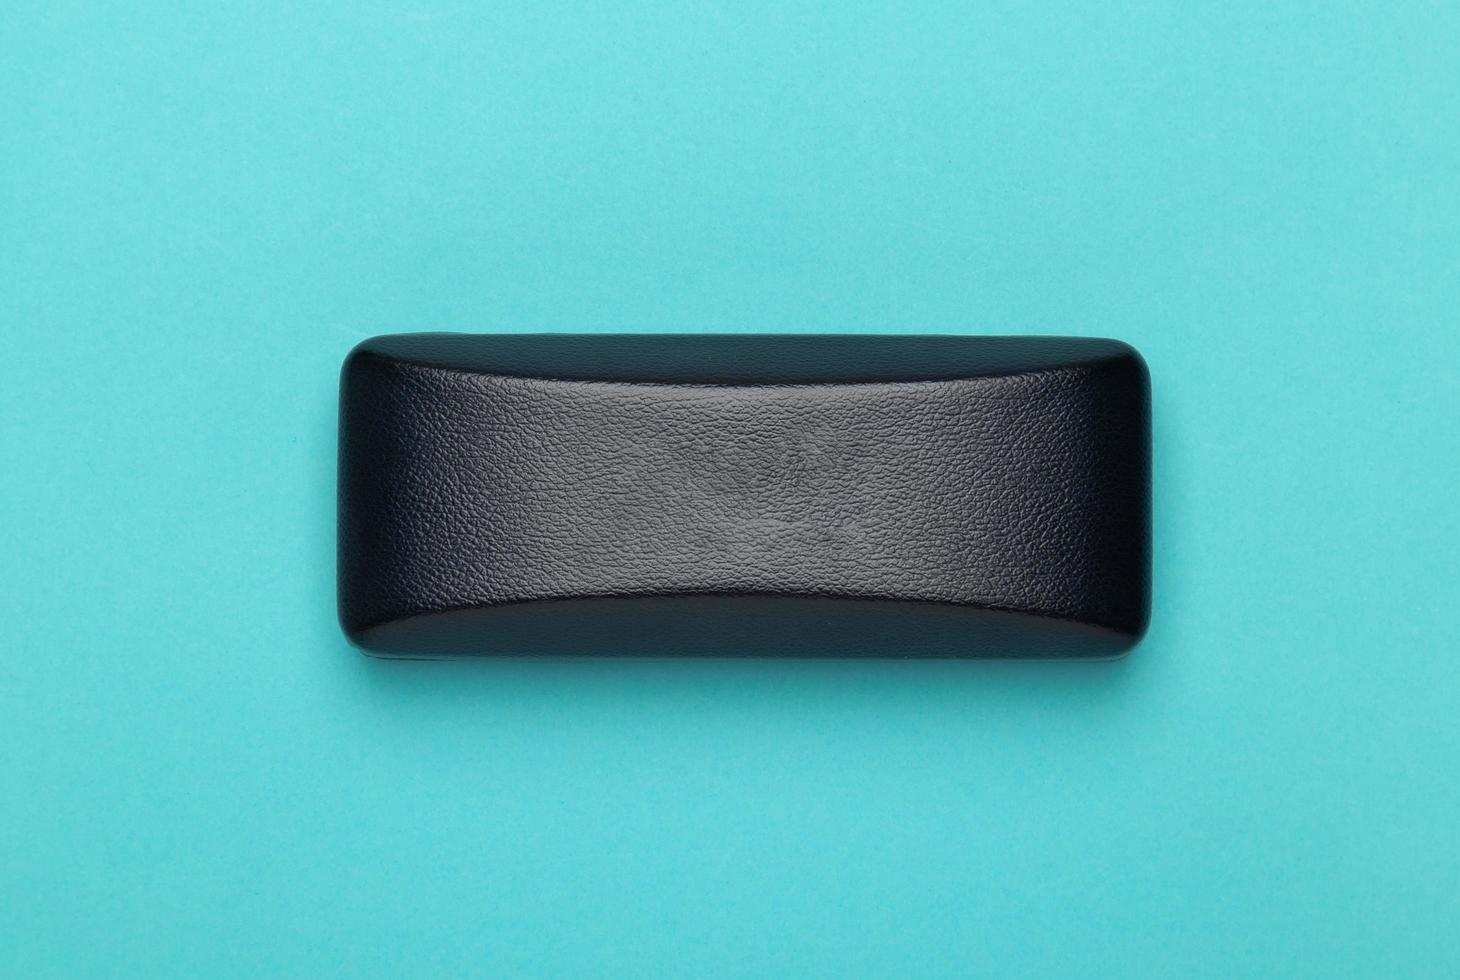 Sunglasses box on blue background photo